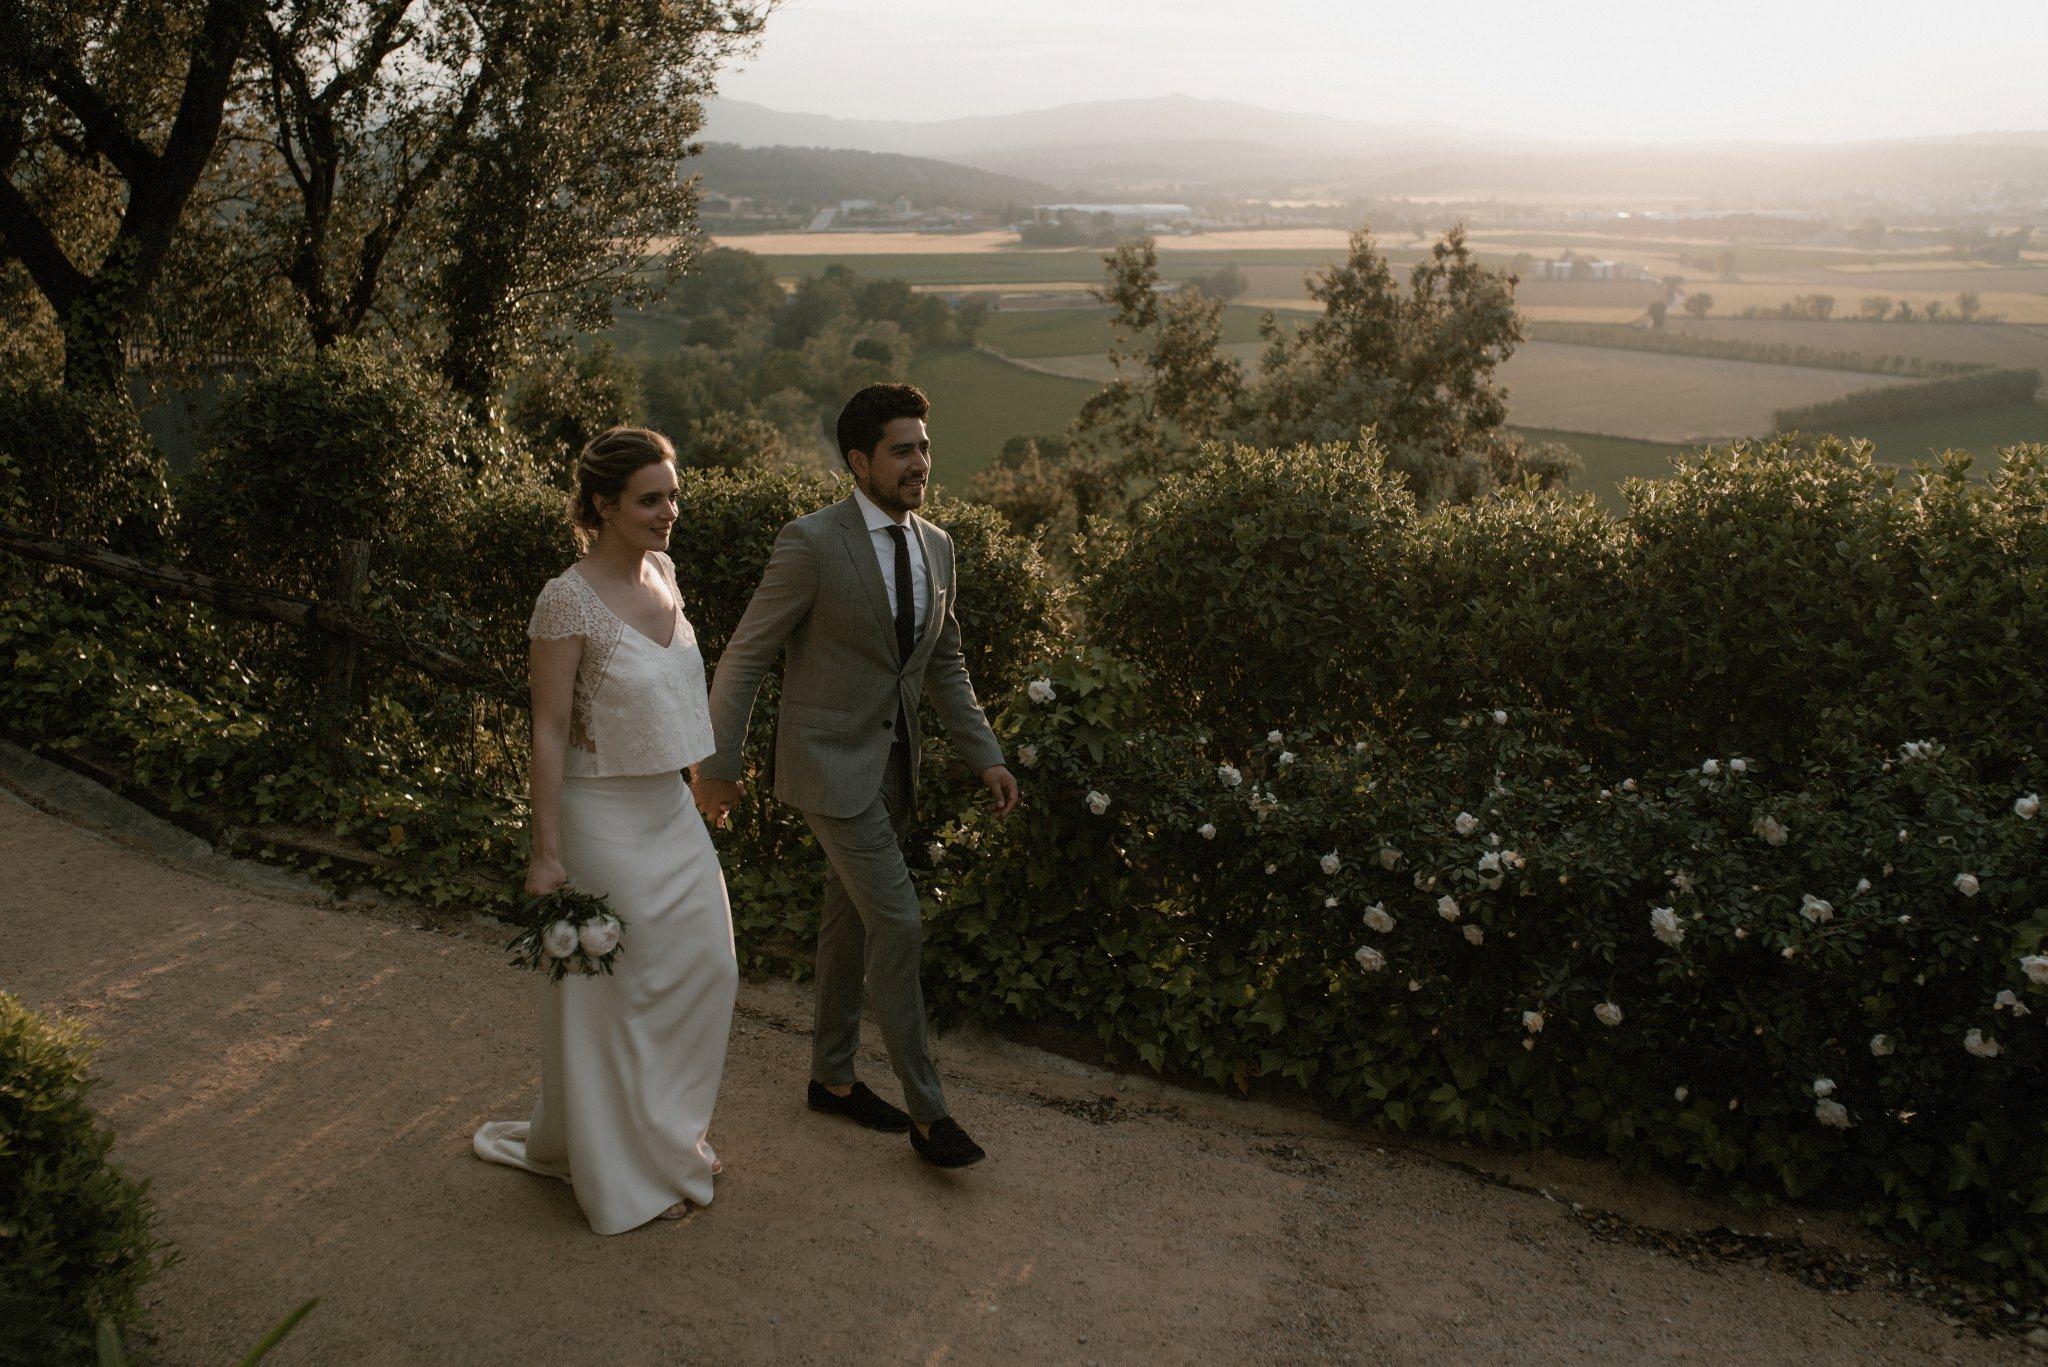 Bruidsfotograaf Spanje Castle d'Emporda destination wedding Naomi van der Kraan00062.jpg